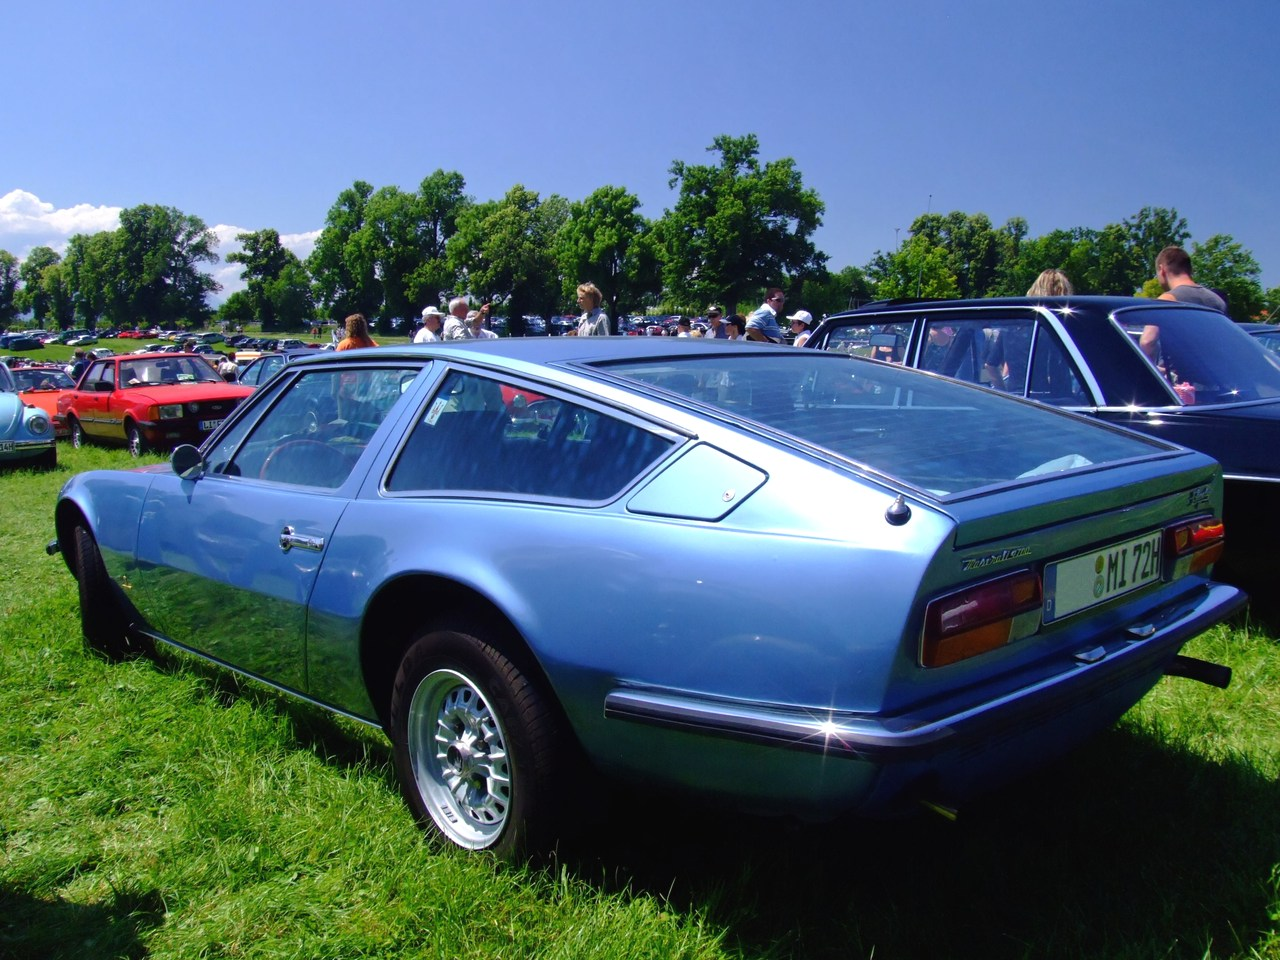 Maserati_Indy_America_4700_2.jpg